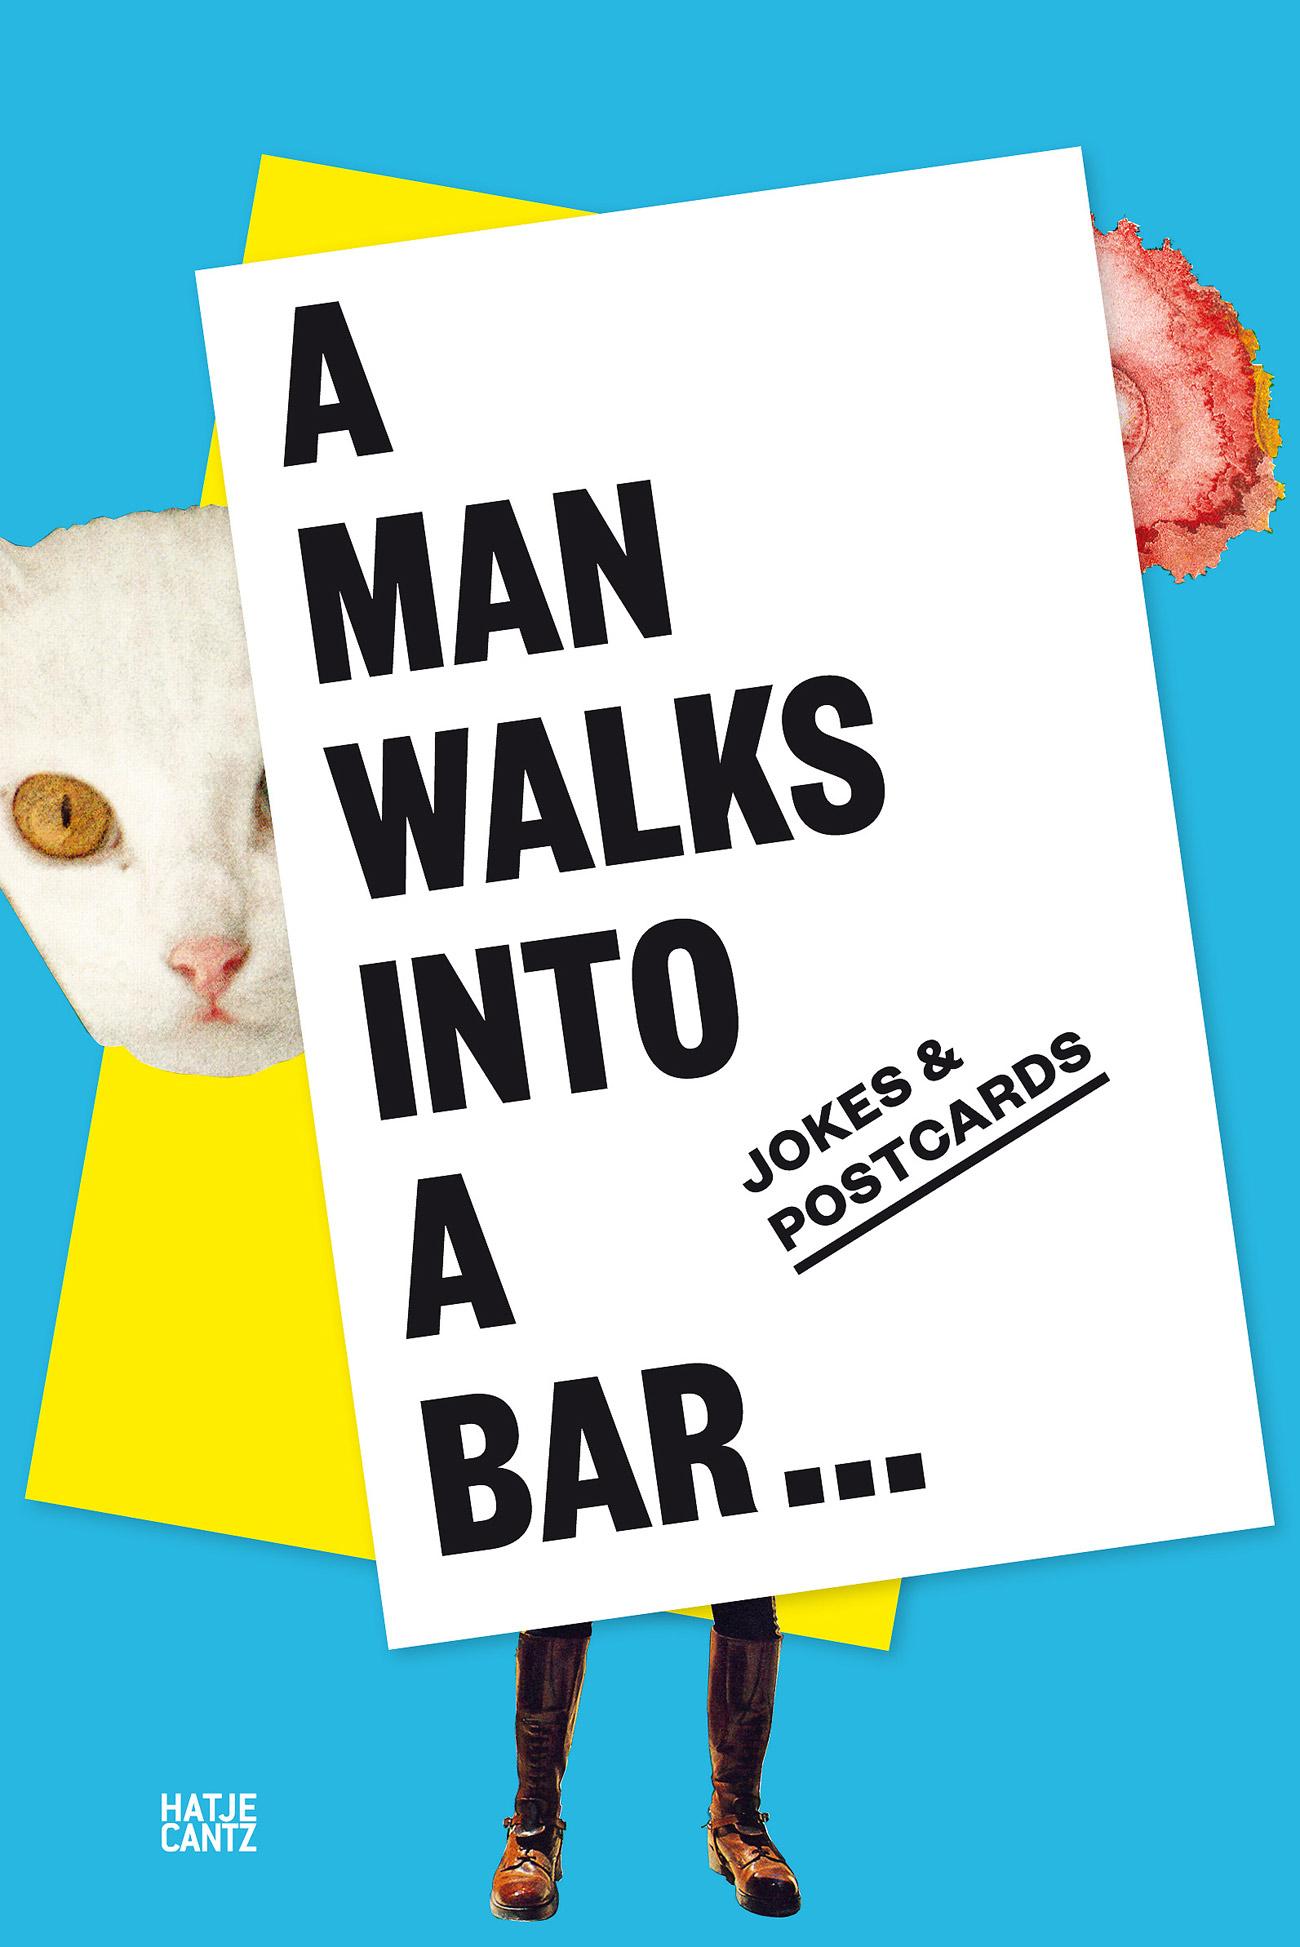 SZ_150123_A_Man_walks_HC_AMANWALKS_U1